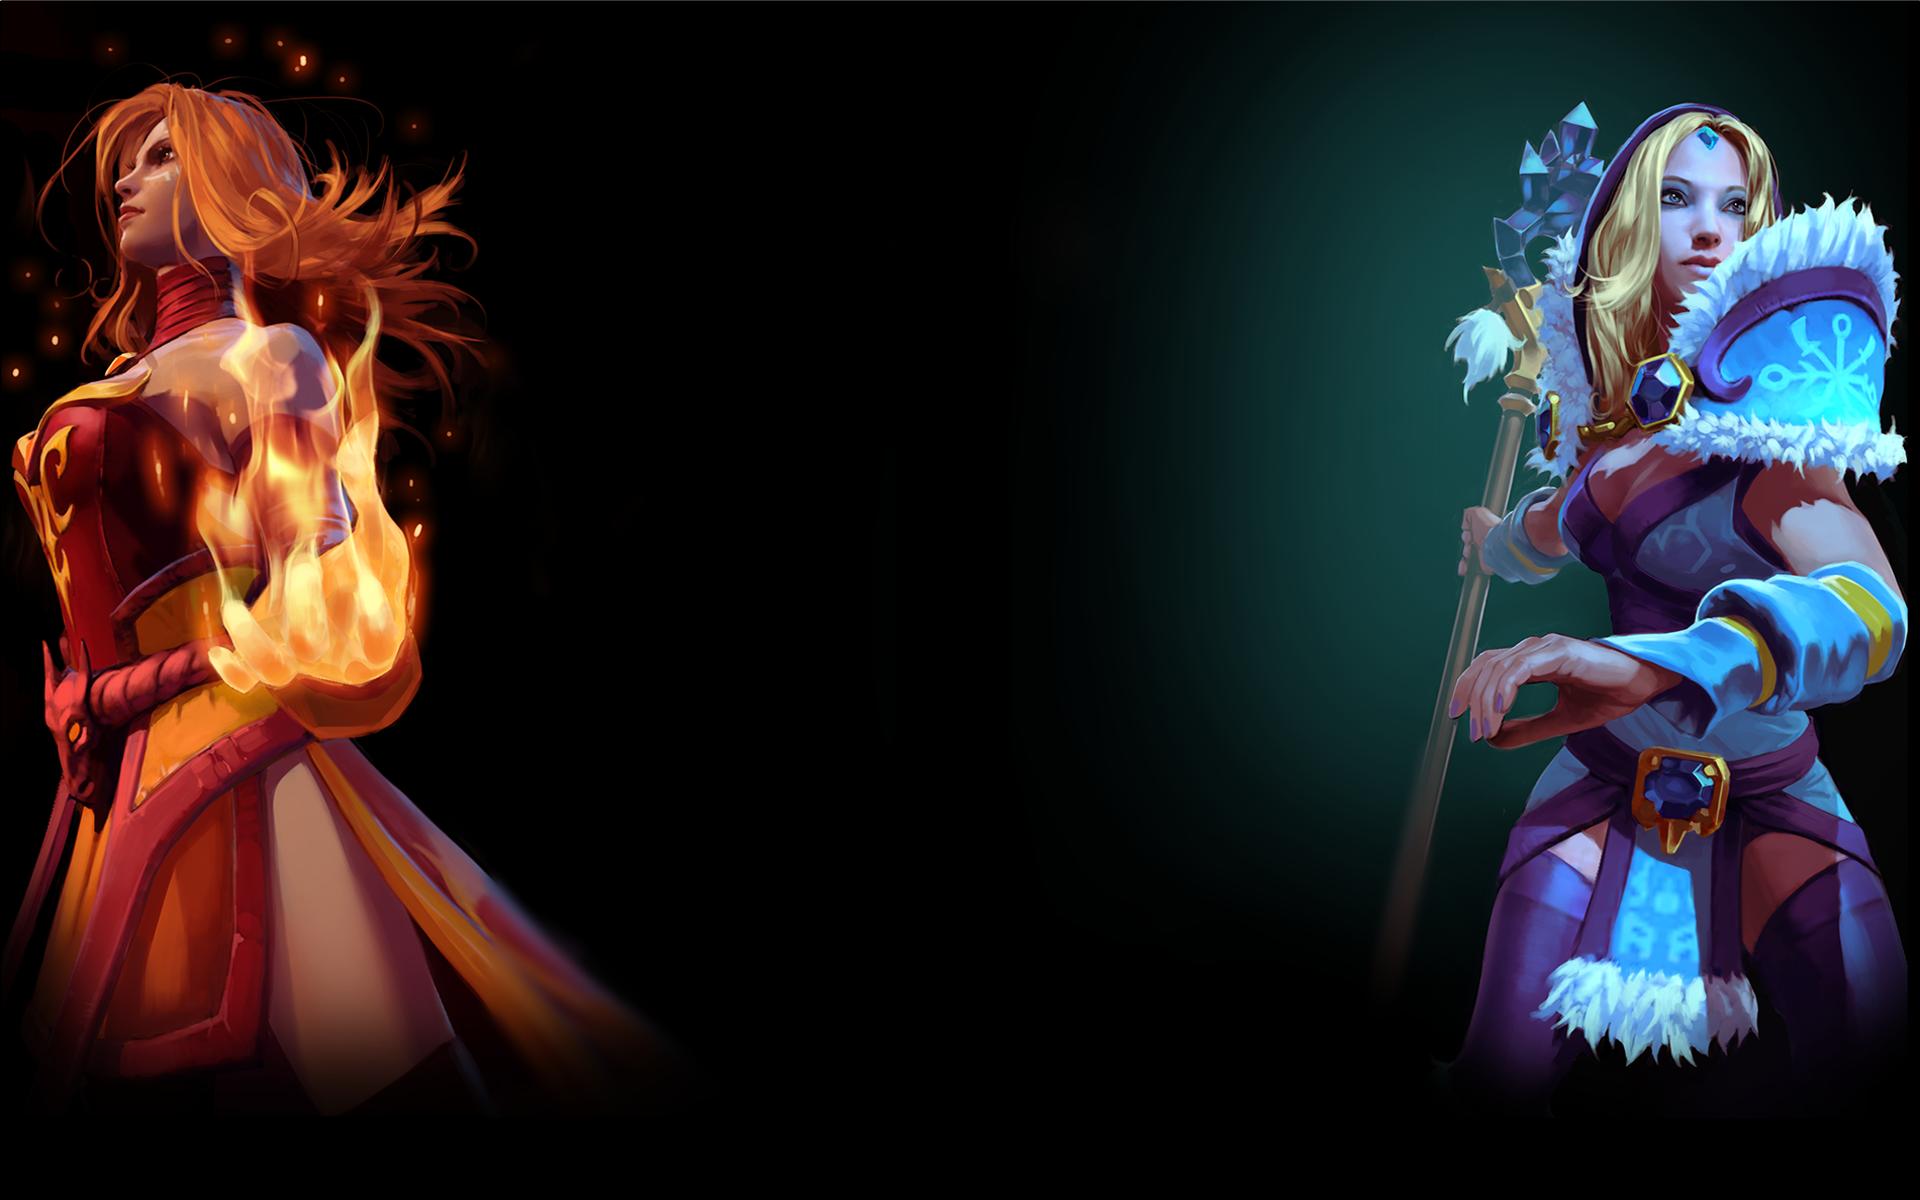 Lina and Crystal Maiden   DotA 2 Wallpaper 4849 1920x1200